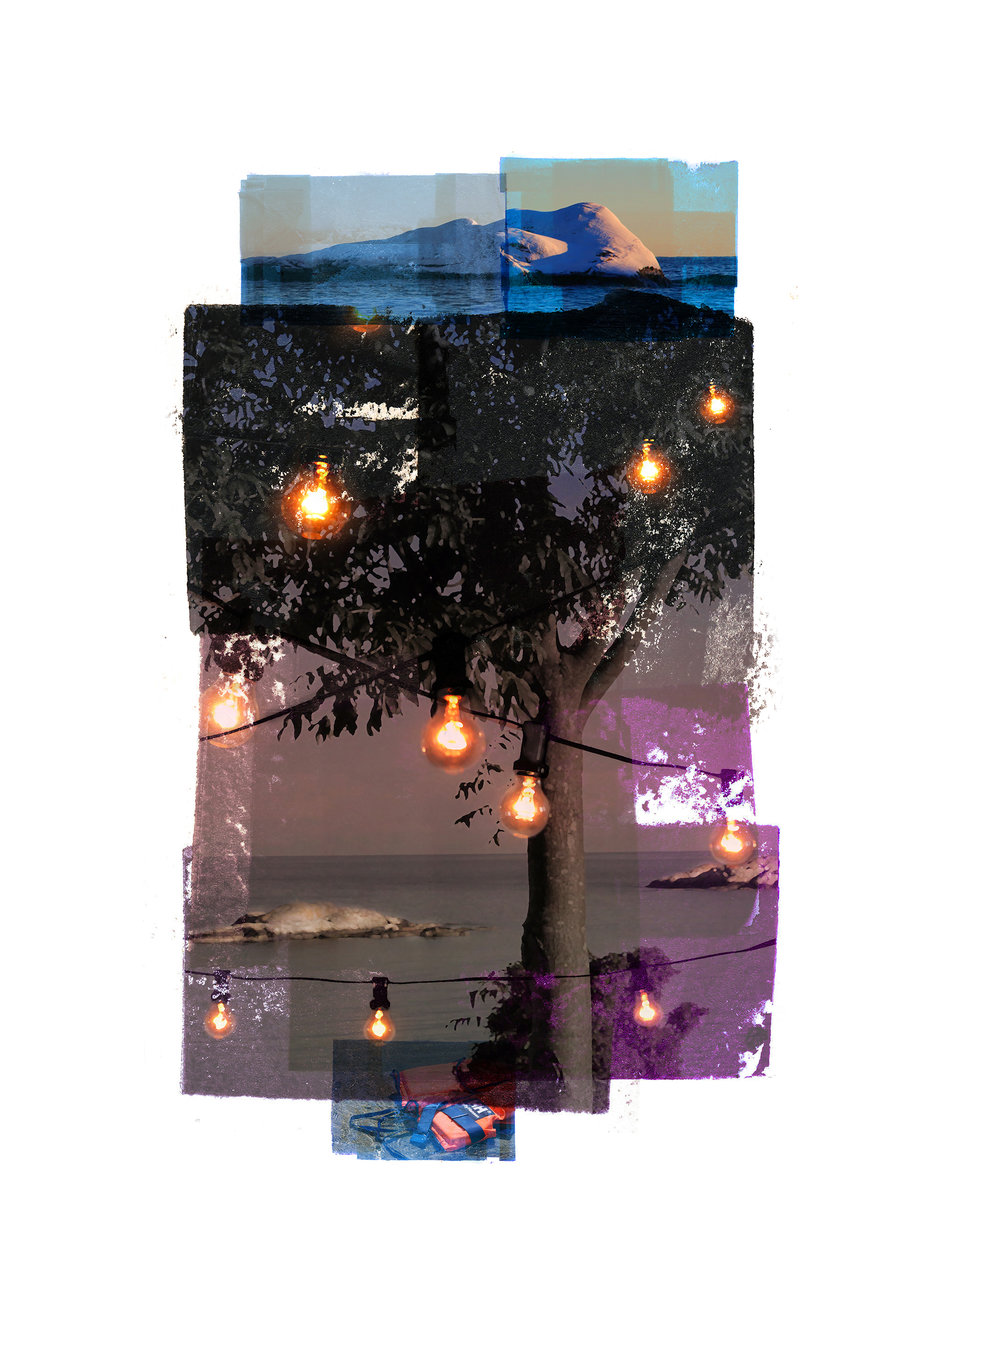 Rim of the party / Wintersun / HH  Original Archival UV Pigment Print / BFK Rives 250 gr 25 x 35 cm / 13,7 x 10 in Edition of 50 + 7 Ap Editeur: Per Fronth Studios / Printer Henrik Aunevik  13/2016: